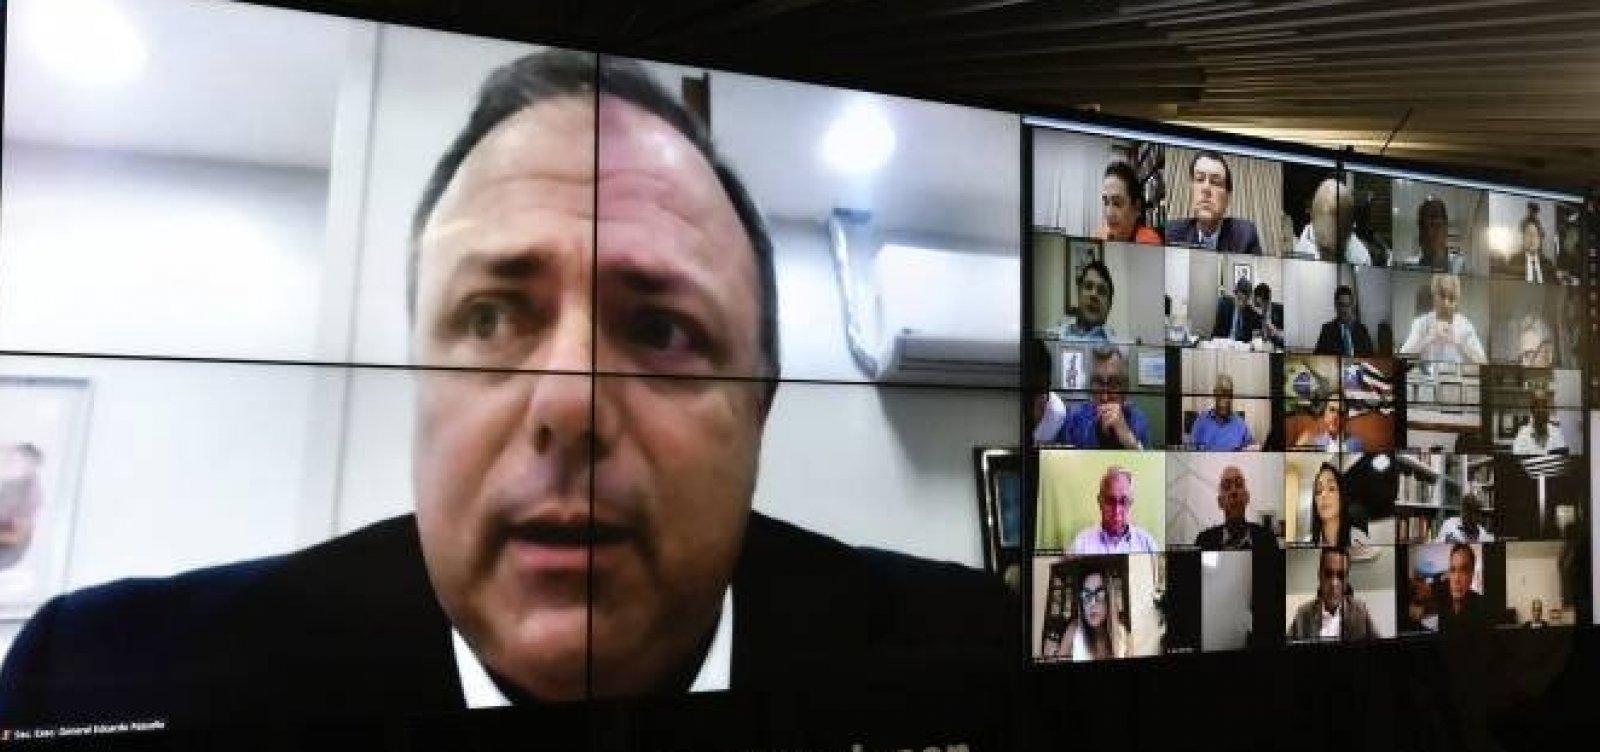 [Pazuello diz que governo vai dar 'transparência infinita' aos dados da pandemia]